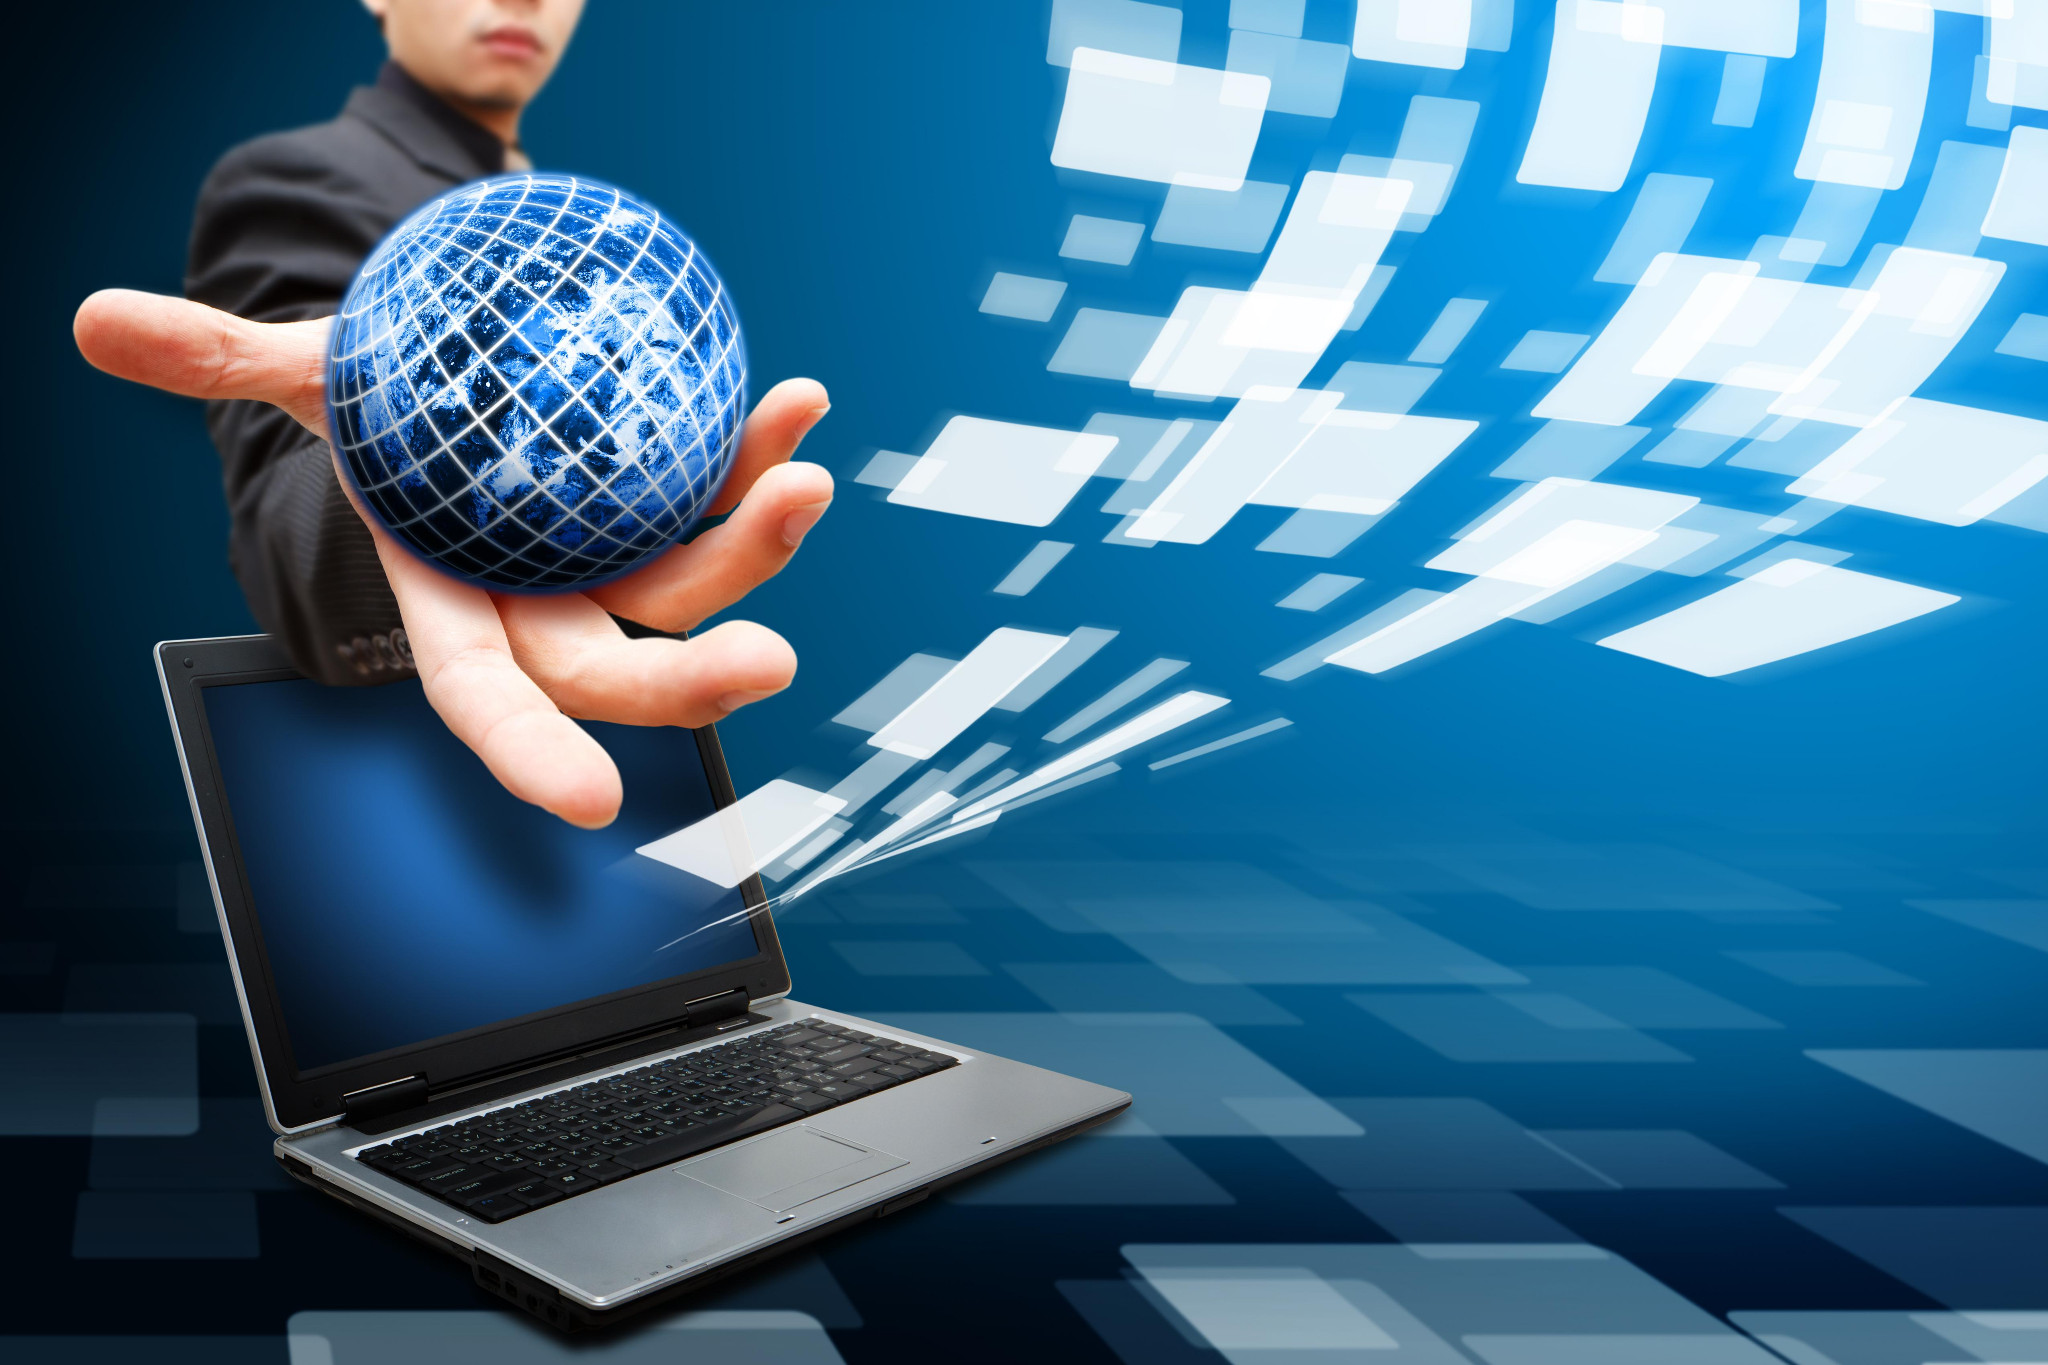 Сервис интернет в картинках